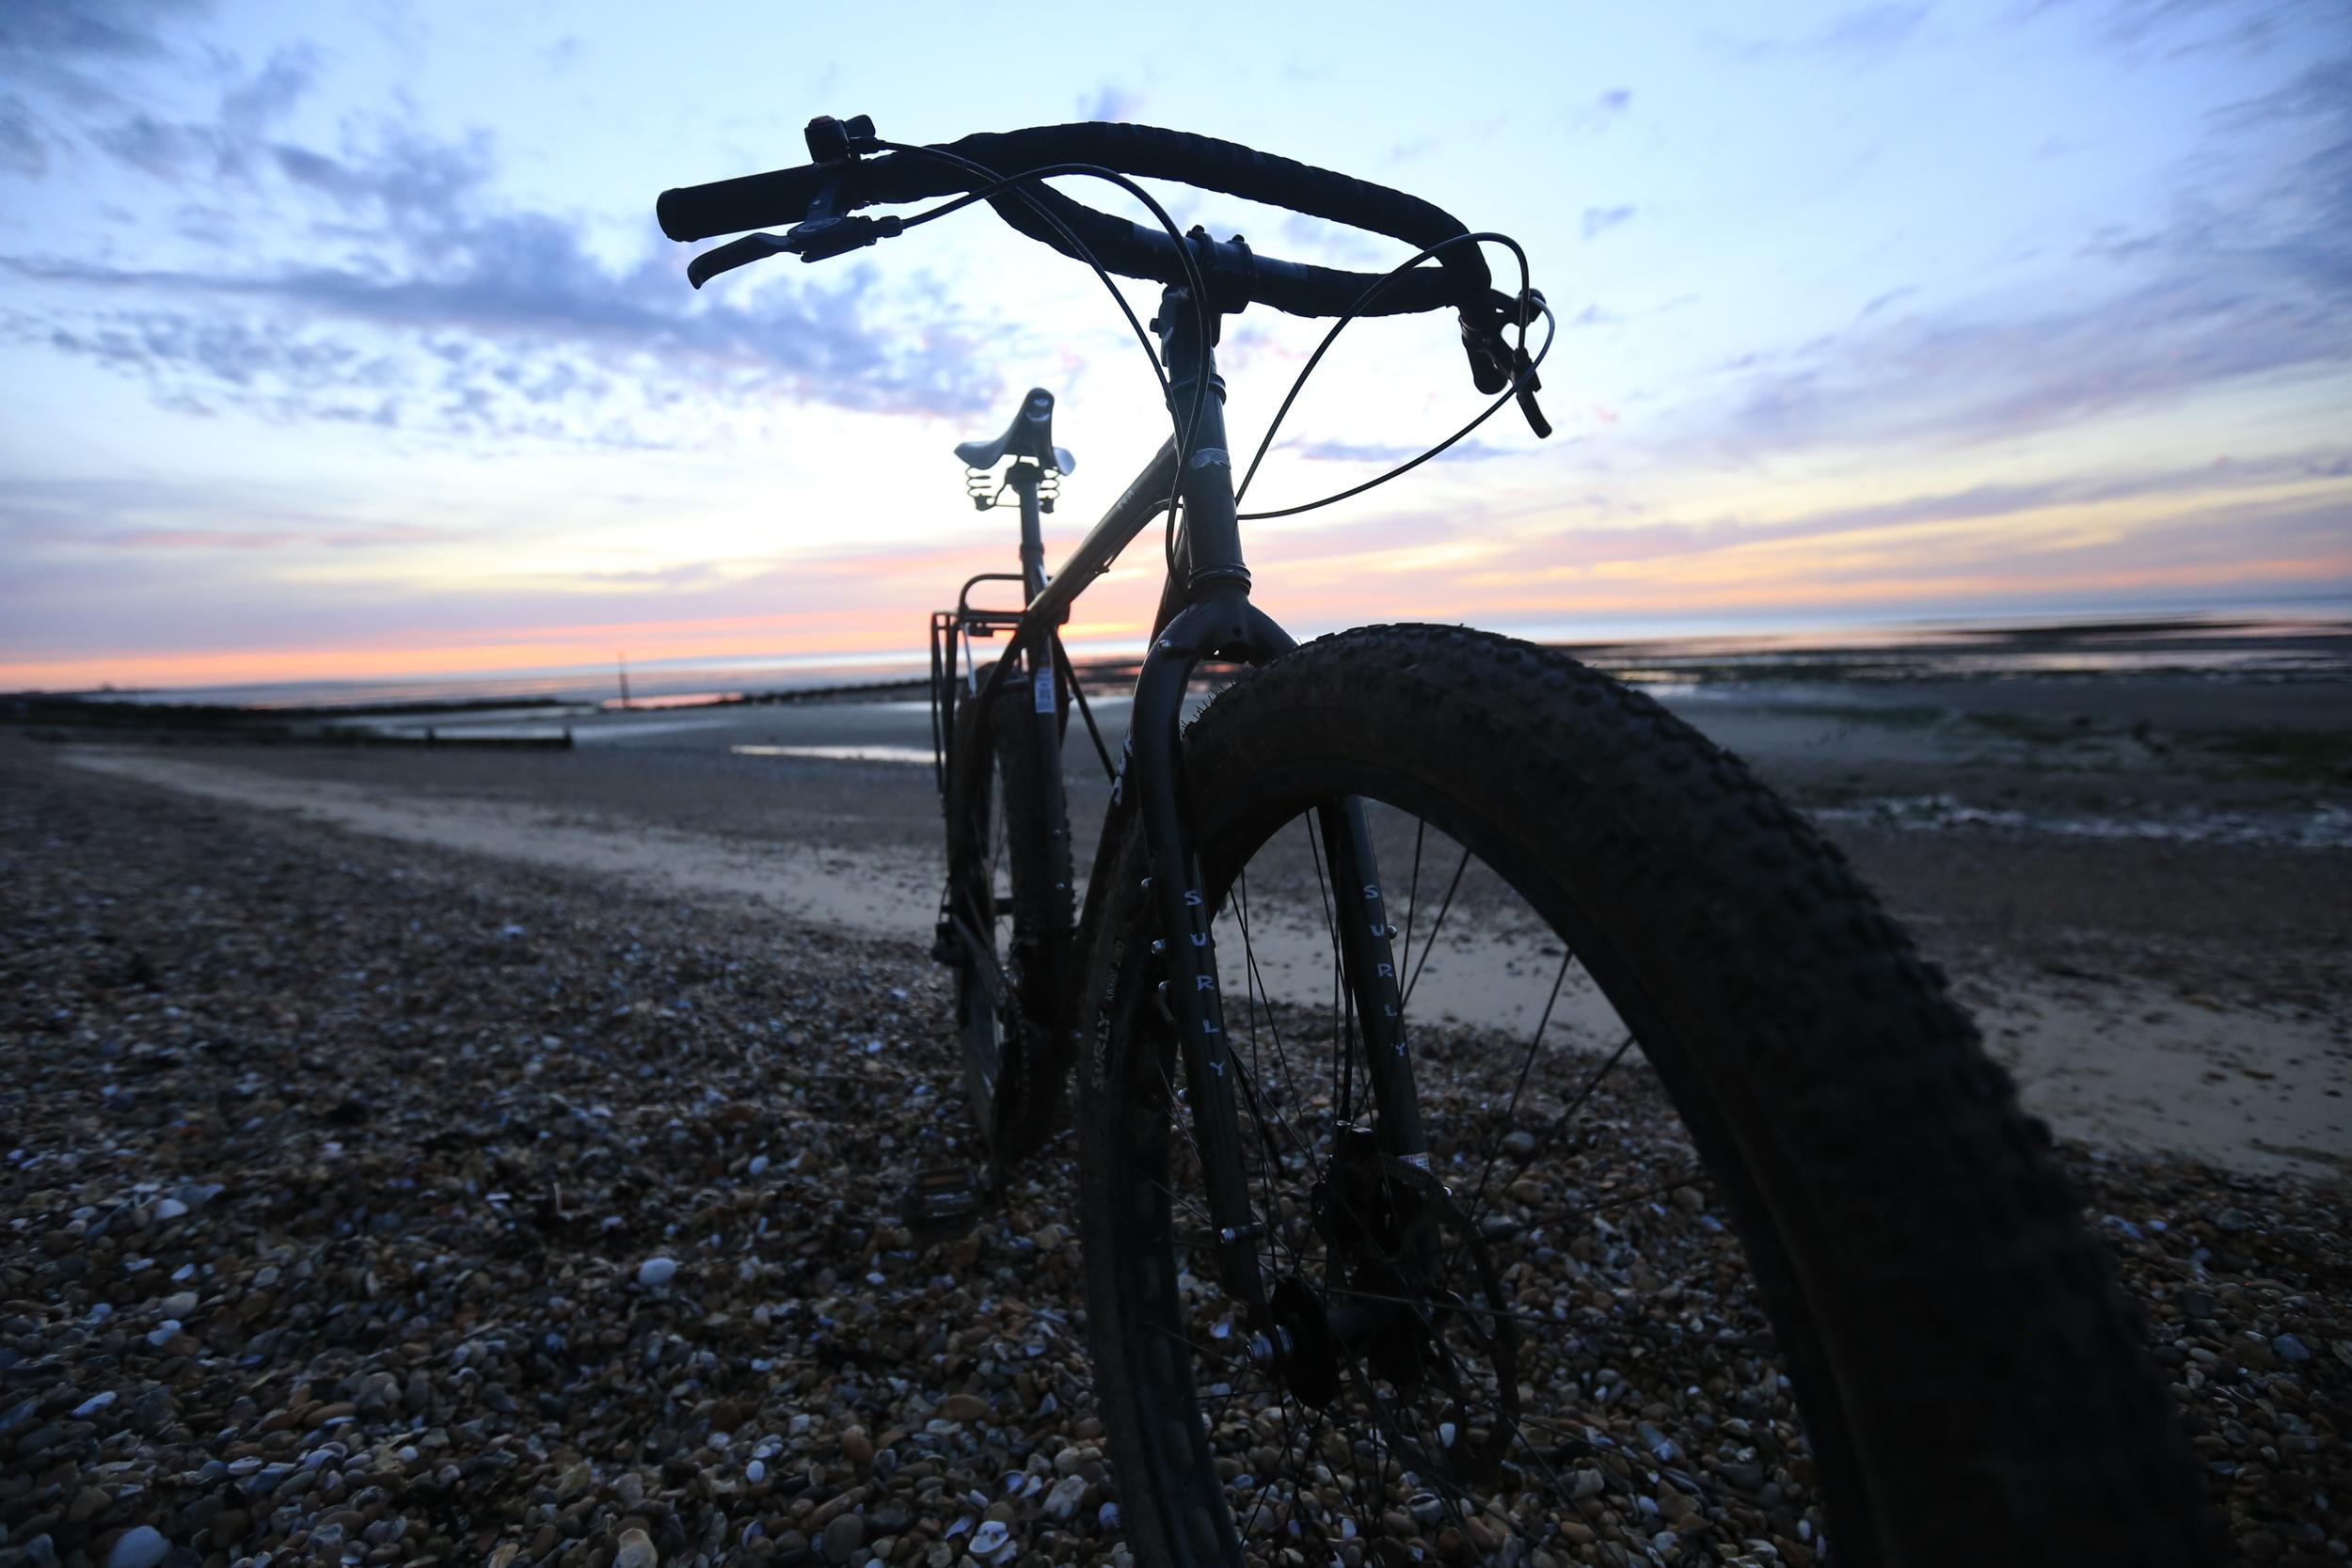 surly, surly ecr, ecr, jones h bar, steel frame, bikepacking, 29 x 3, beach, landscape photography, travel photography, bikepacking blog, cycling blog, mtb, cycling gear